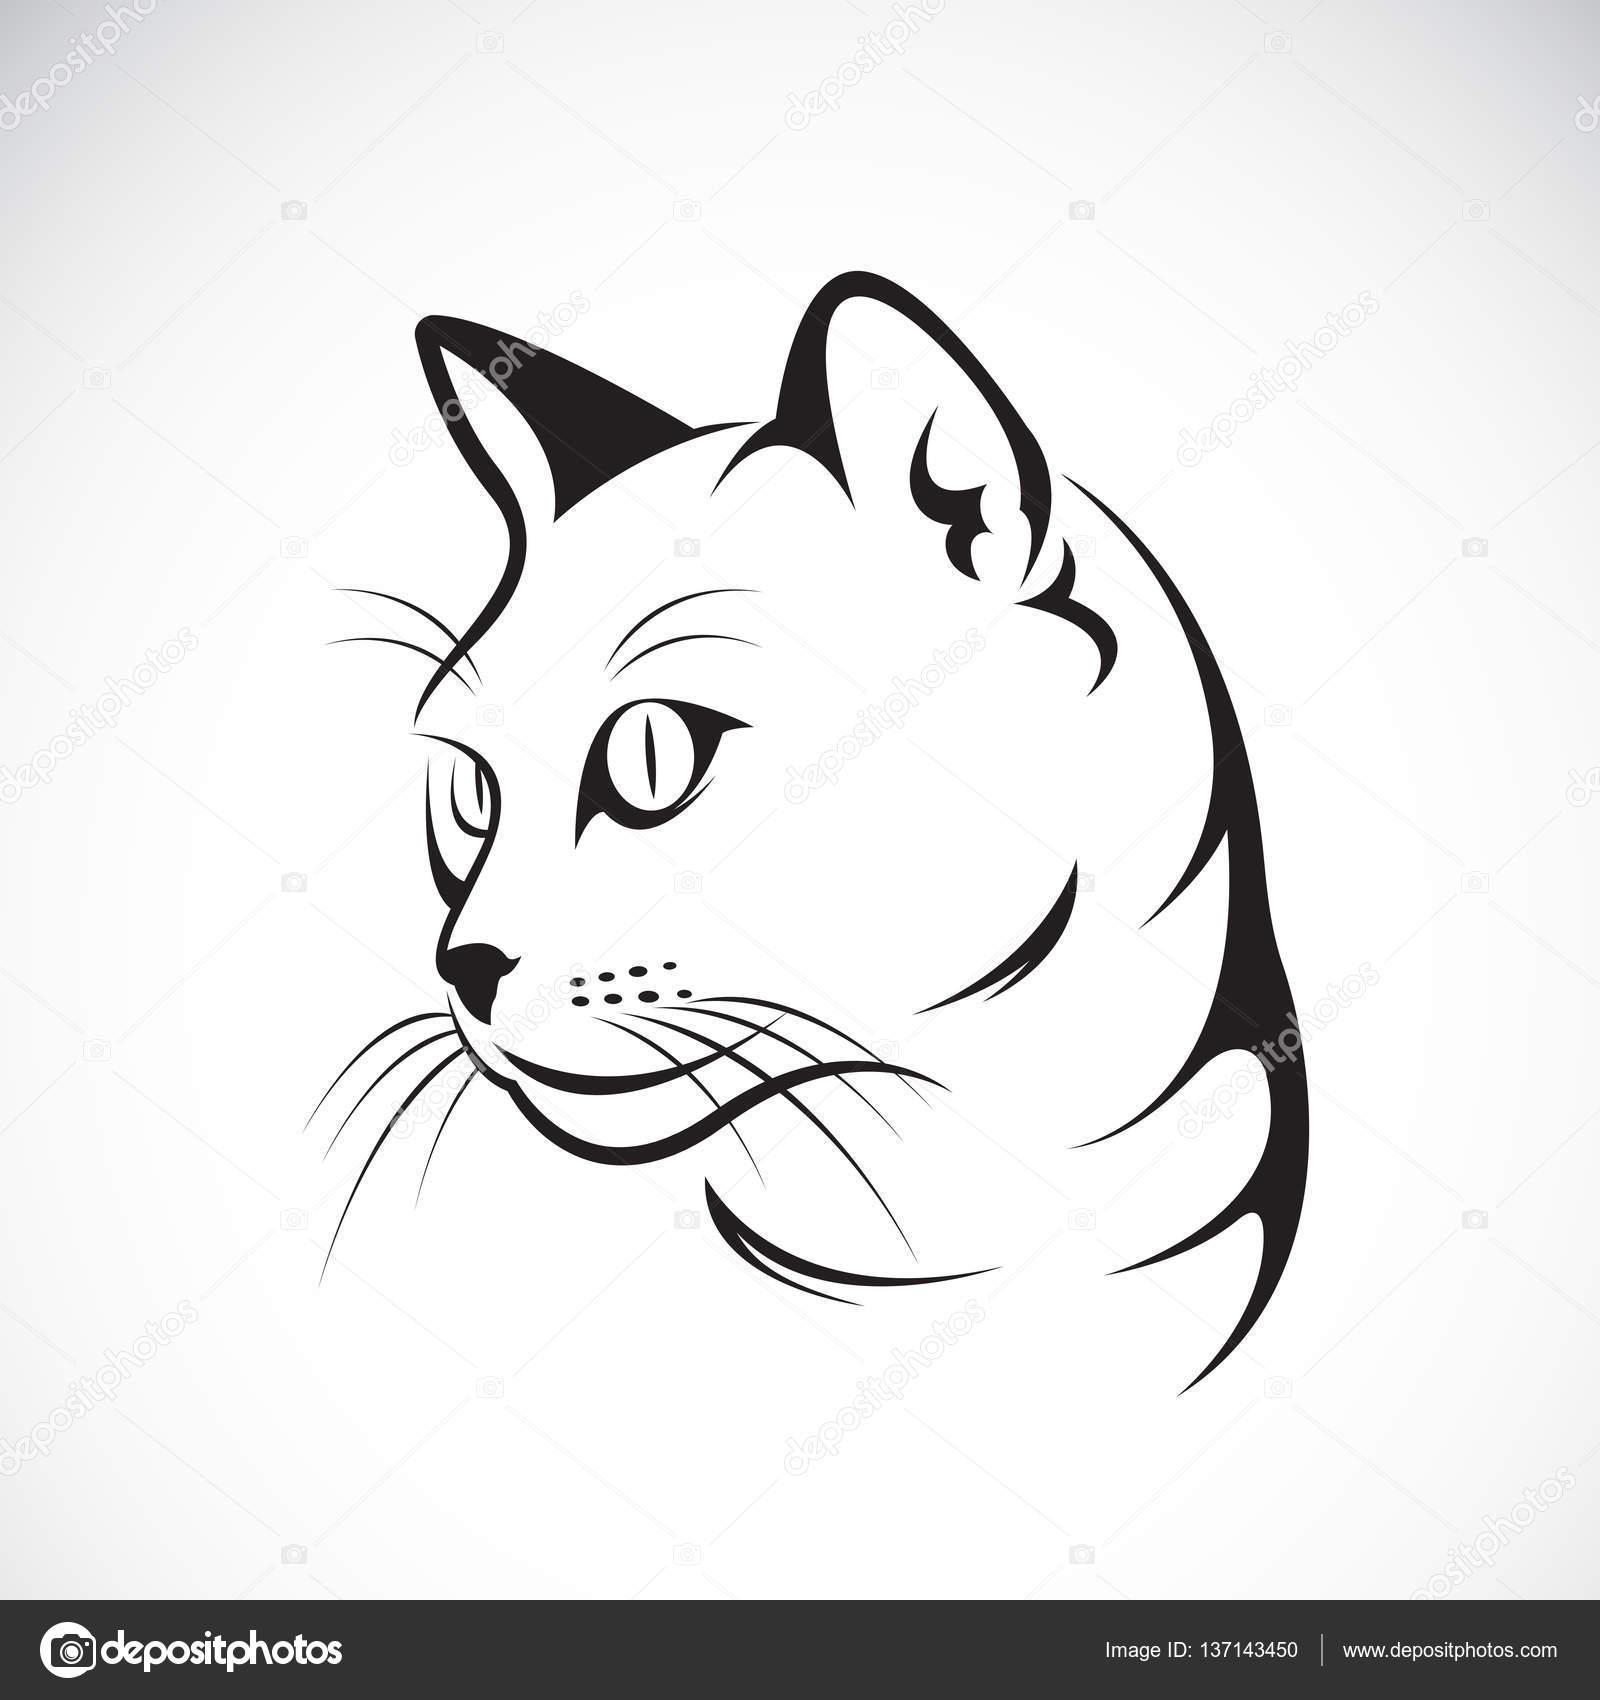 vetor de um desenho de rosto de gato no fundo branco vetor illustra